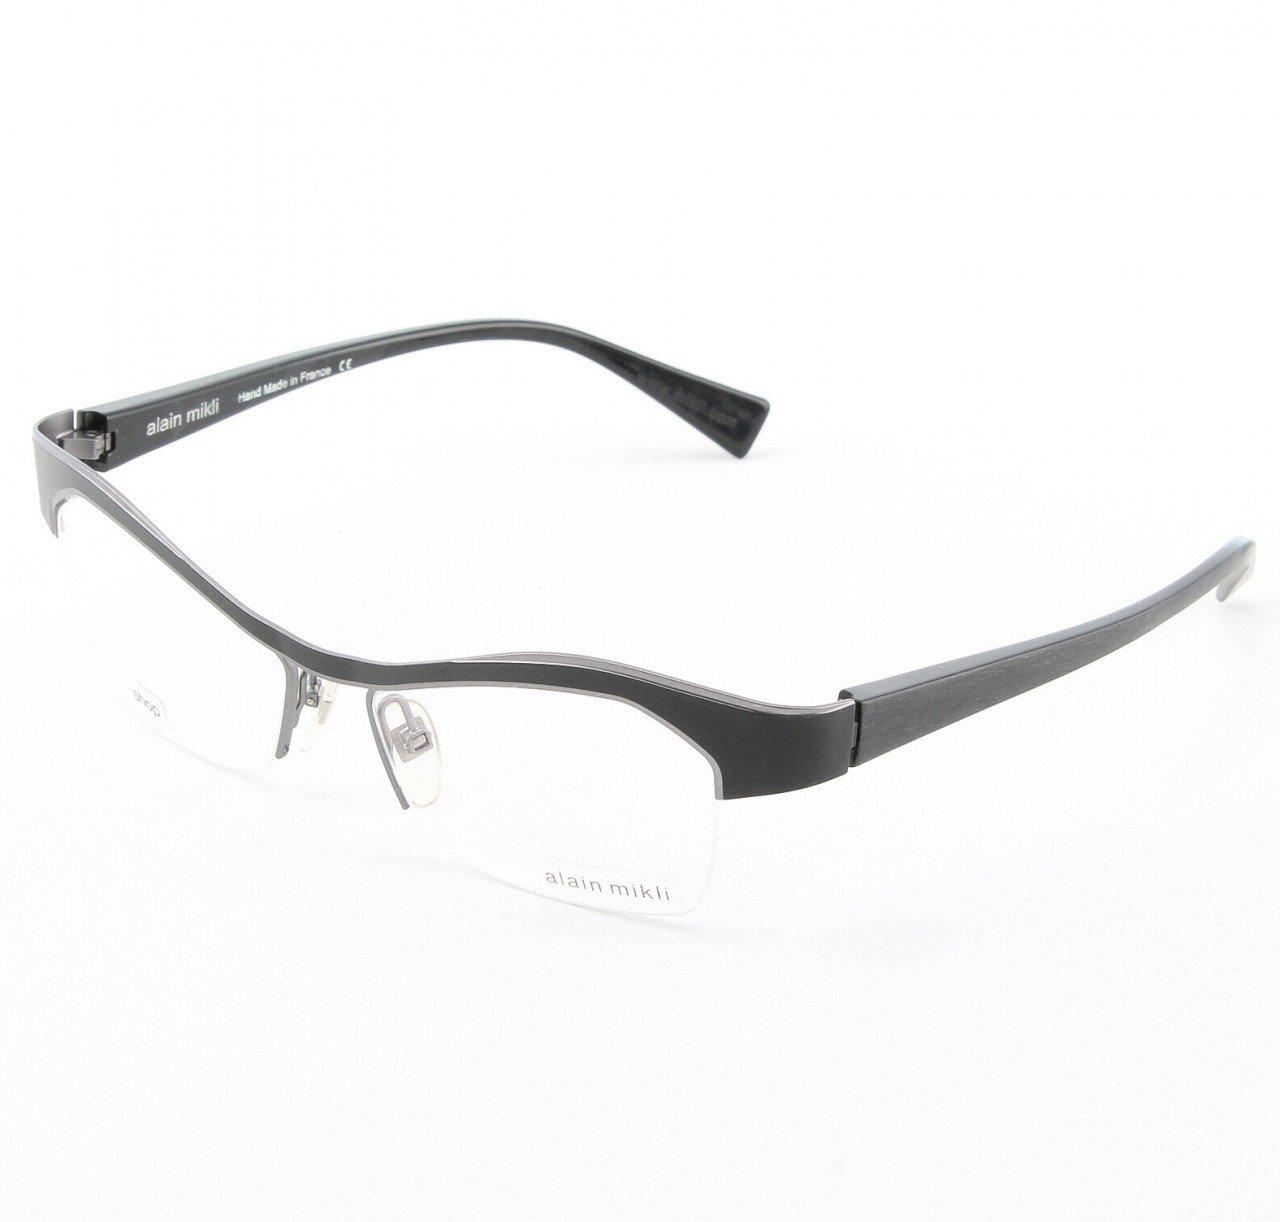 Alain Mikli Eyeglasses AL1053 Col. 1 Matte Black with Silver Trim